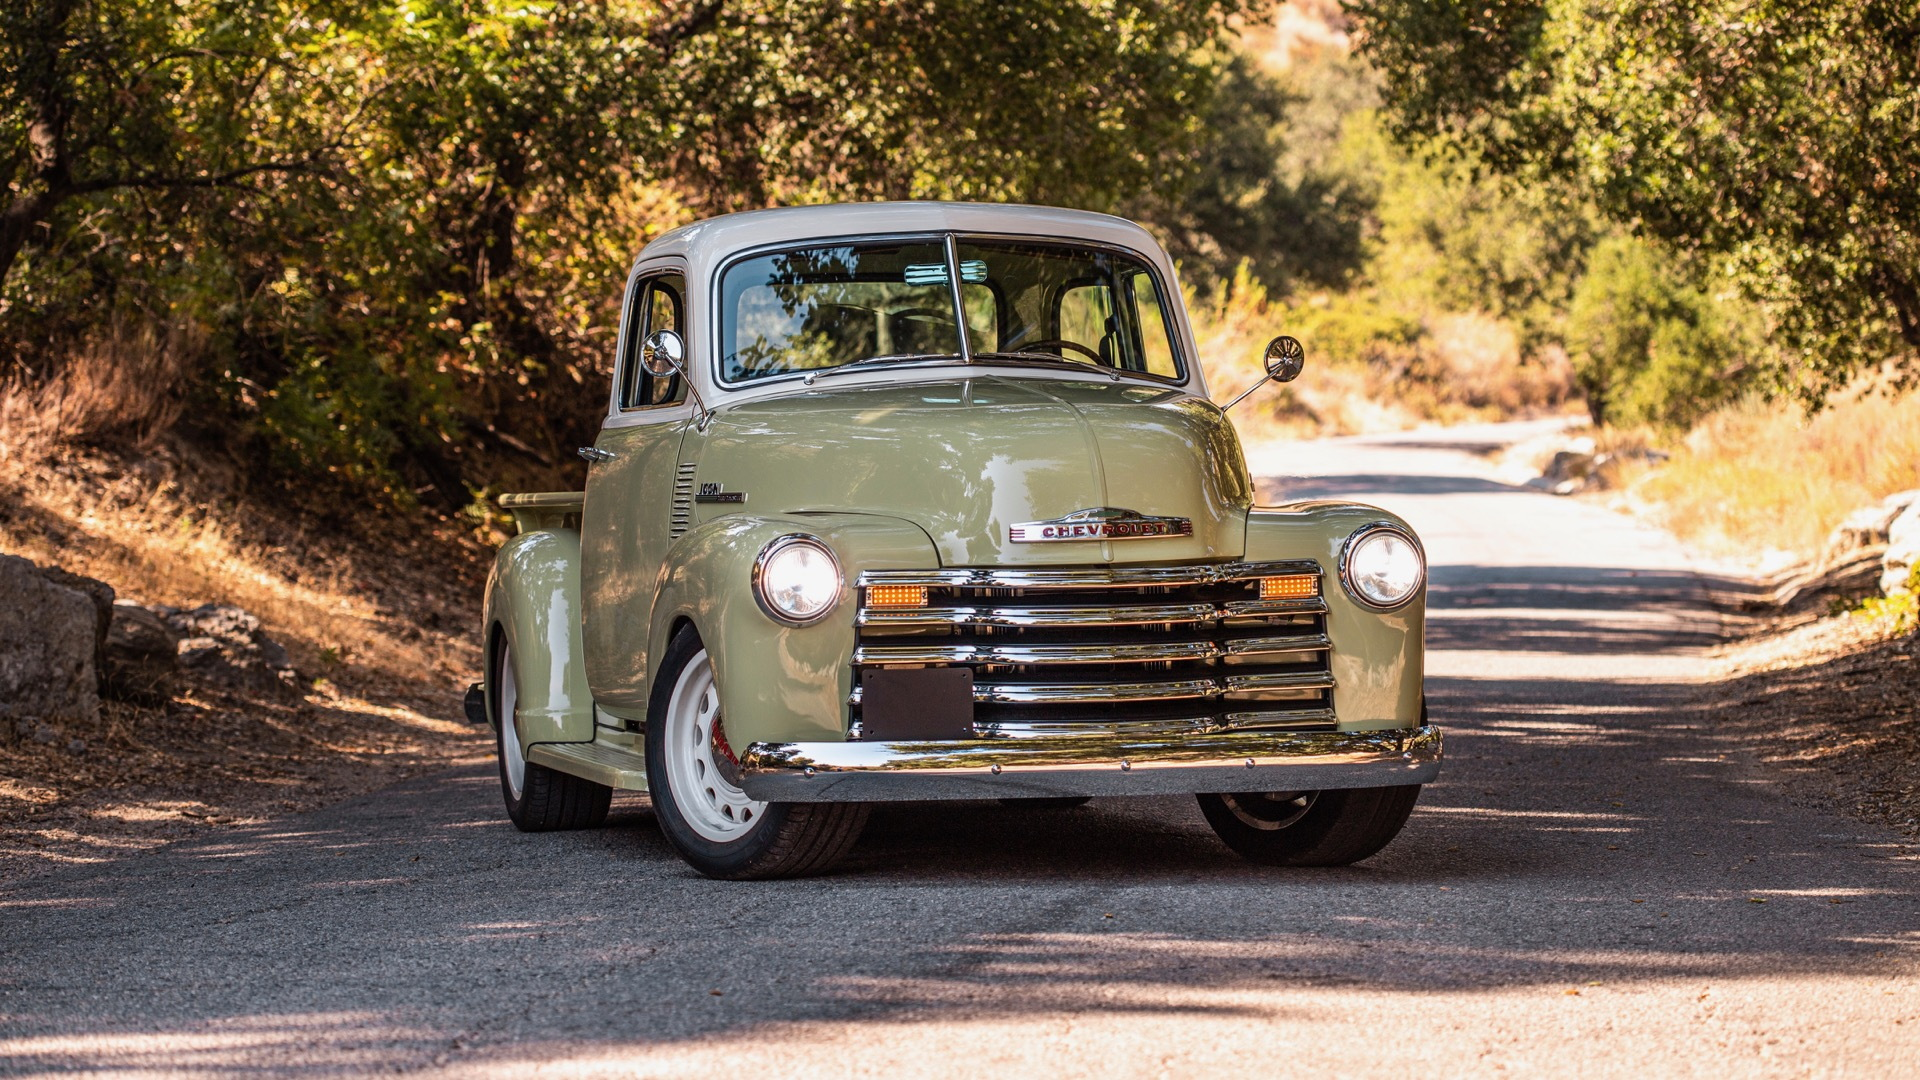 Icon 1950 Chevrolet Thriftmaster pickup Truck